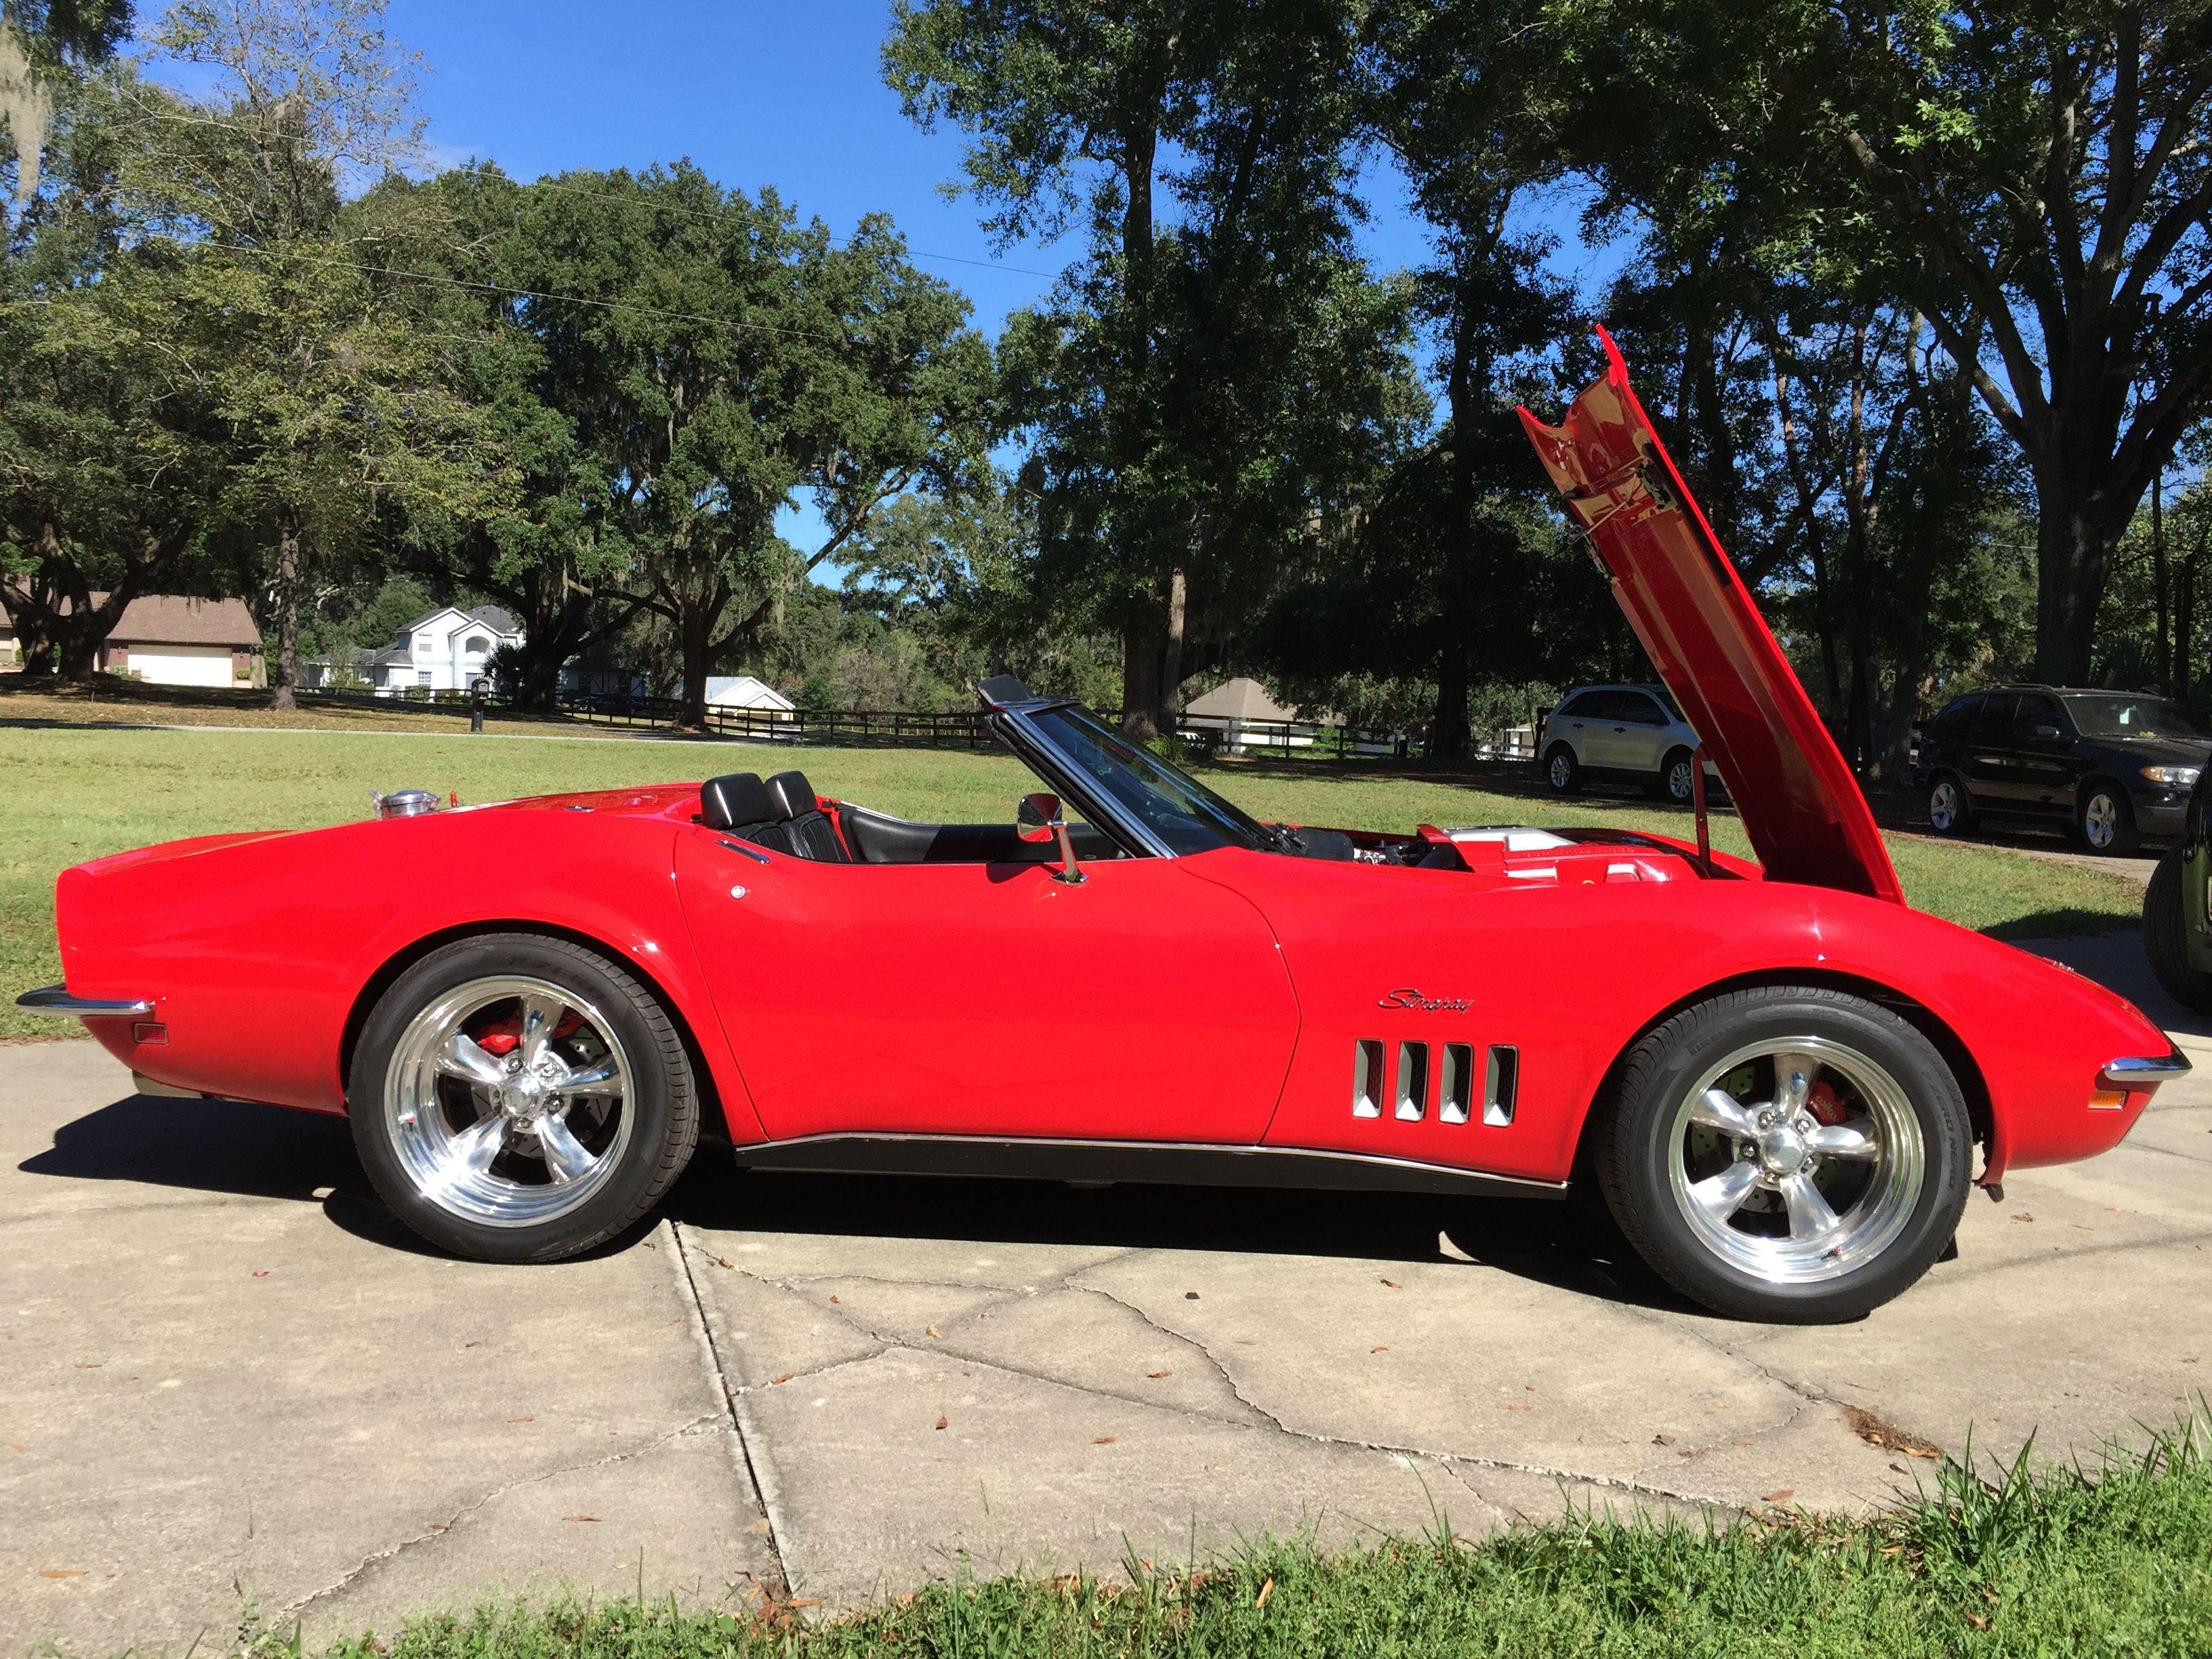 1969 Corvette Restomod   Gspot   1969 corvette, Corvette